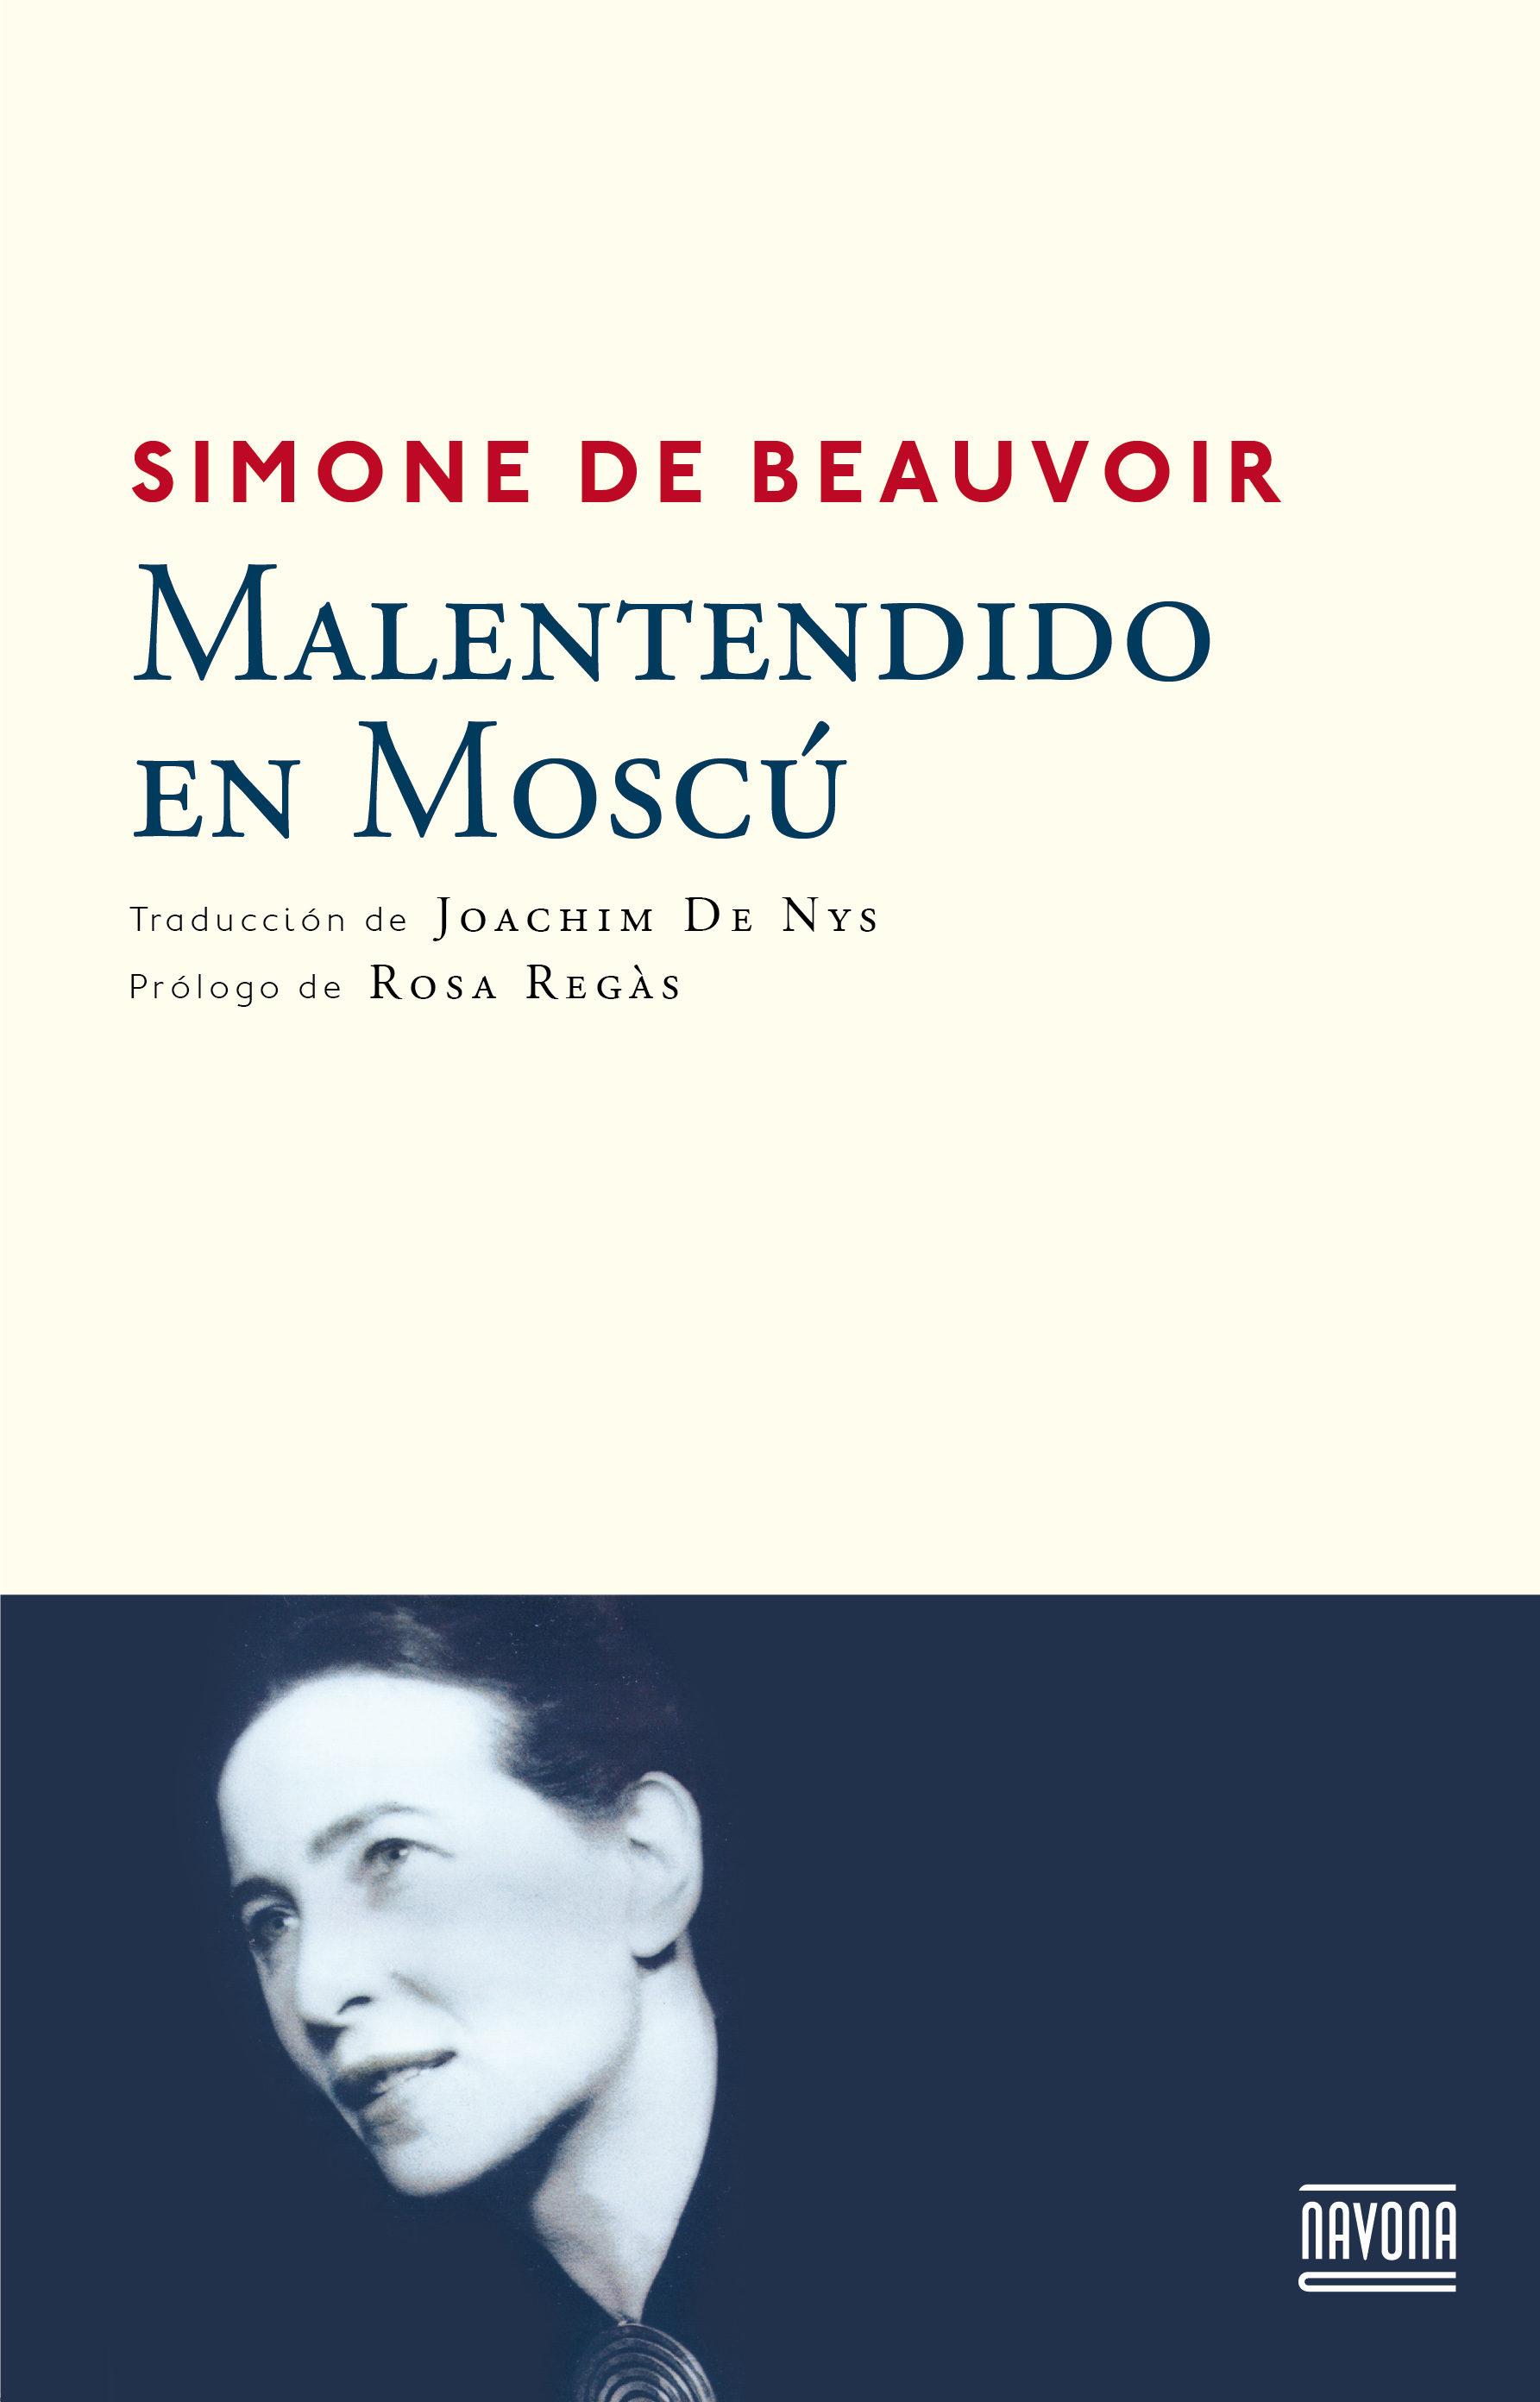 Malentendido en Moscu - Simone De Beauvoir - Navona